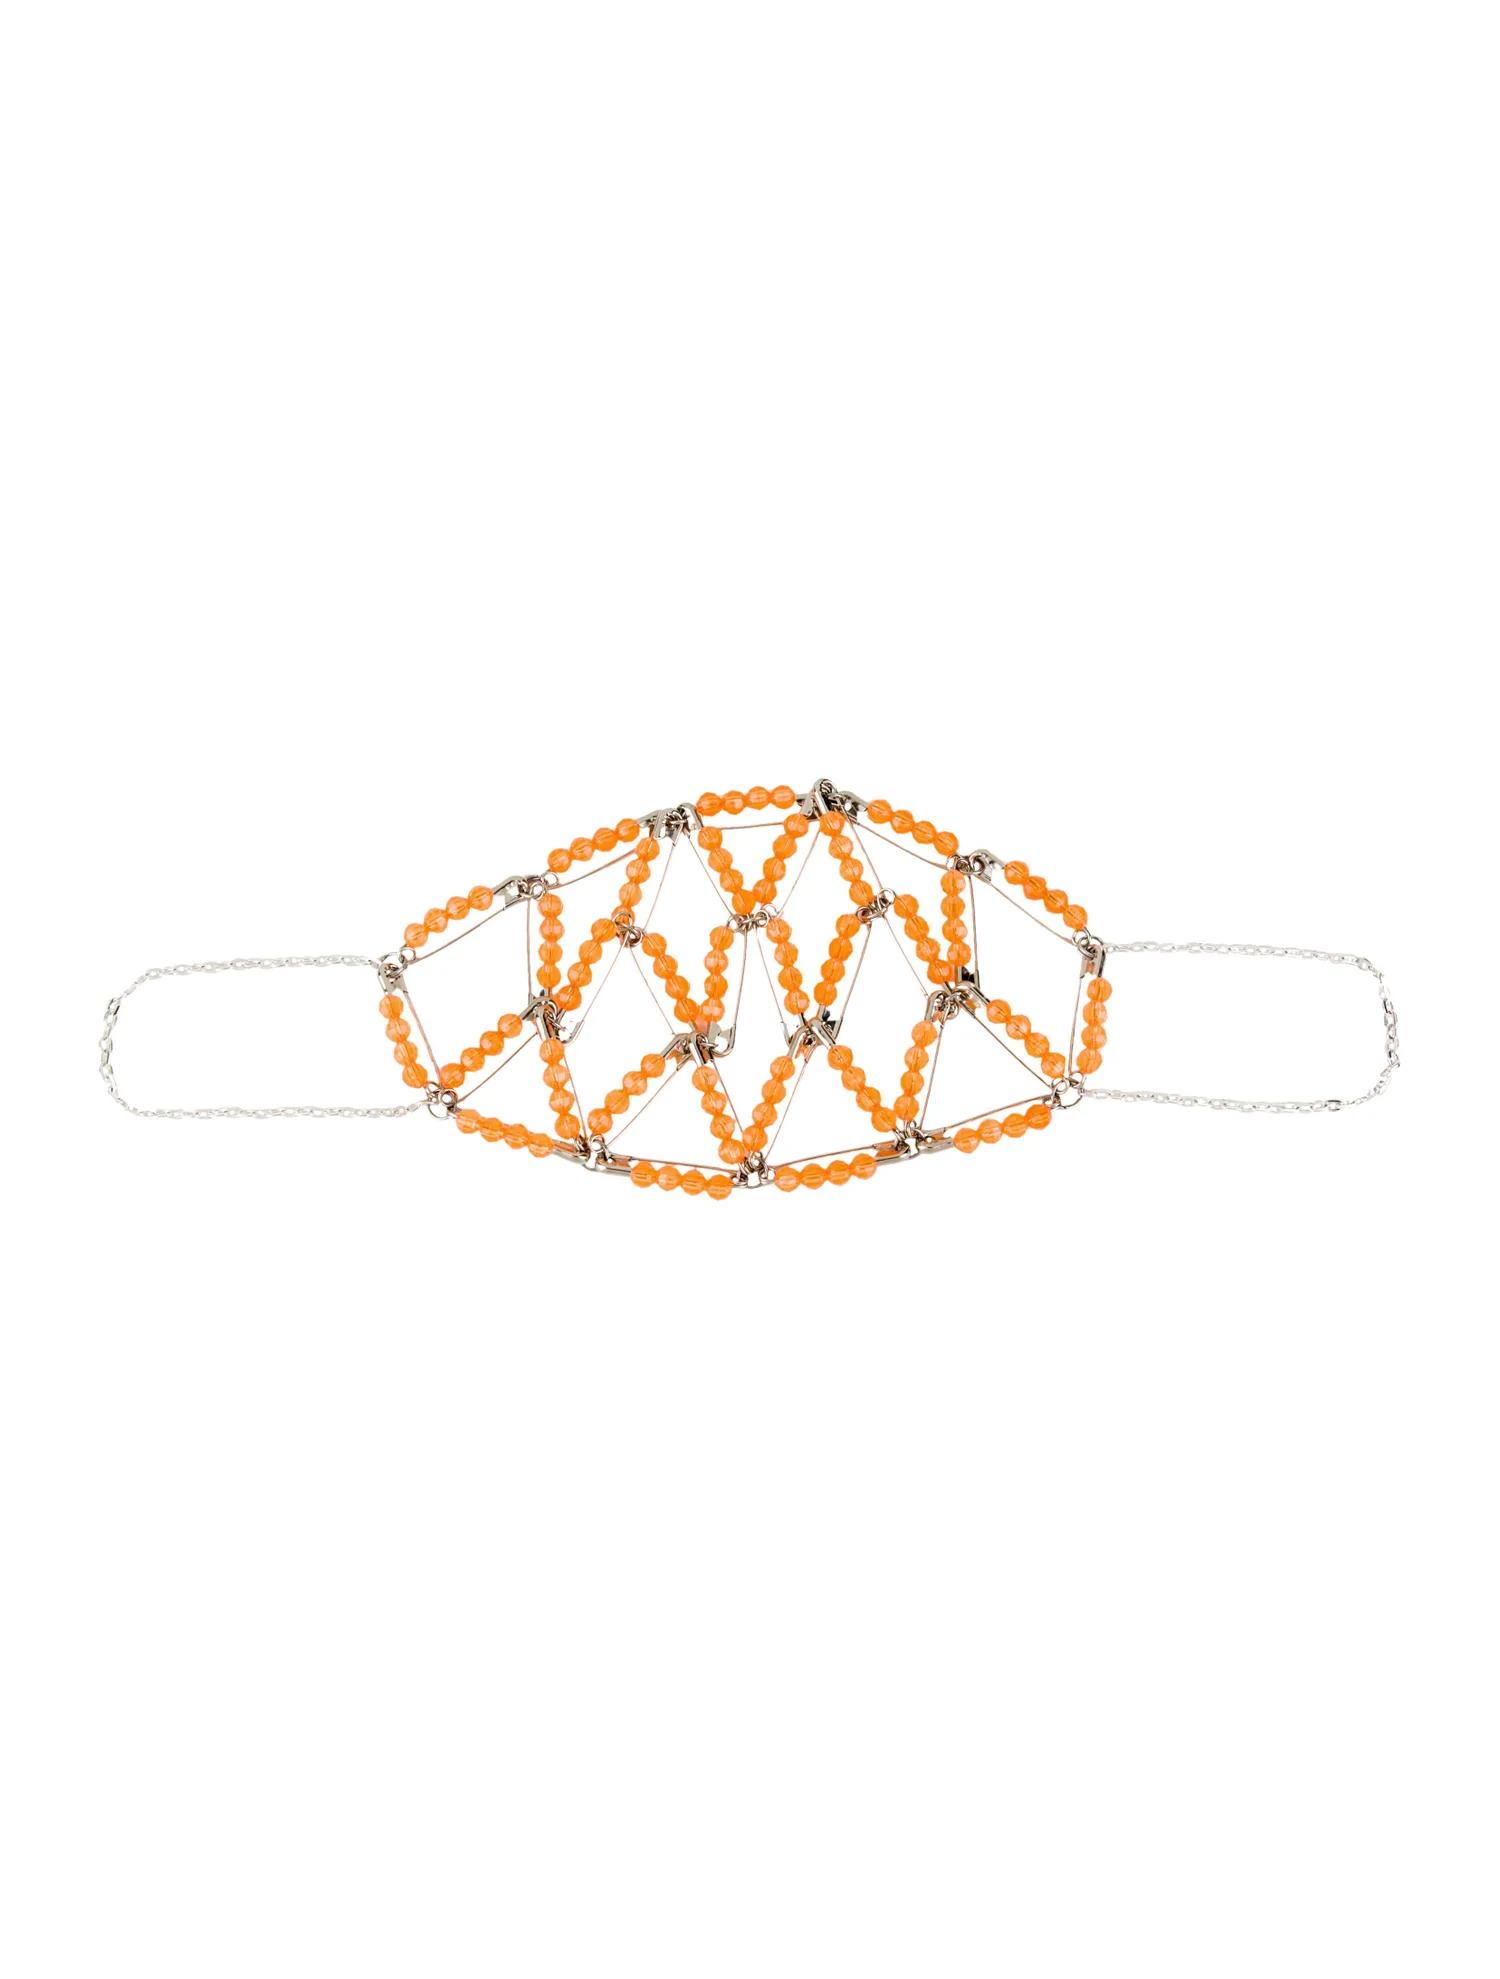 Tangerine Decorative Mask